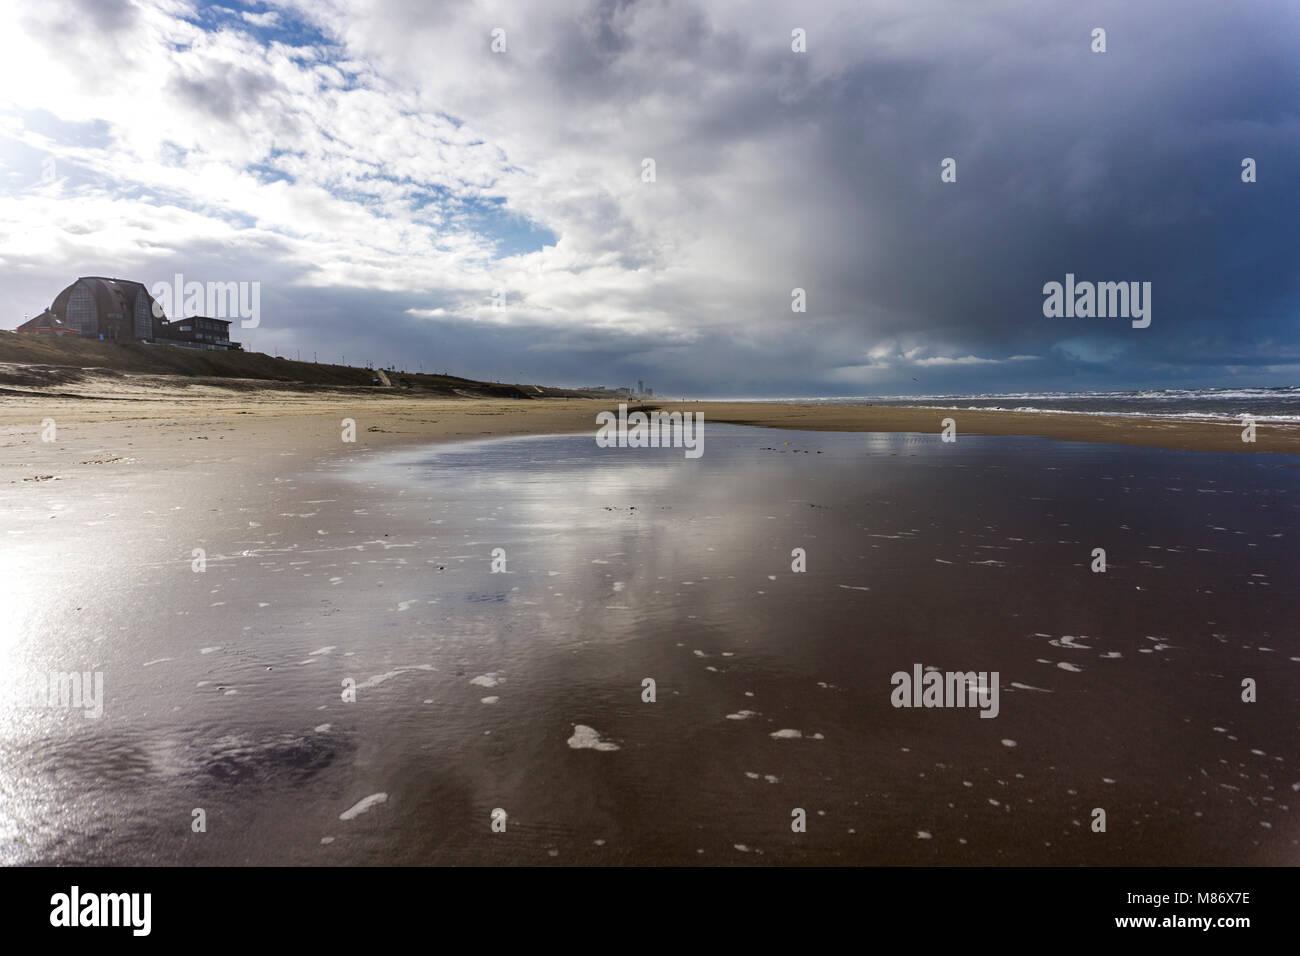 Nordseestrand bei Zandvoort, Provinz Nordholland, Niederlande | North Sea beach near Zandvoort, province of North - Stock Image